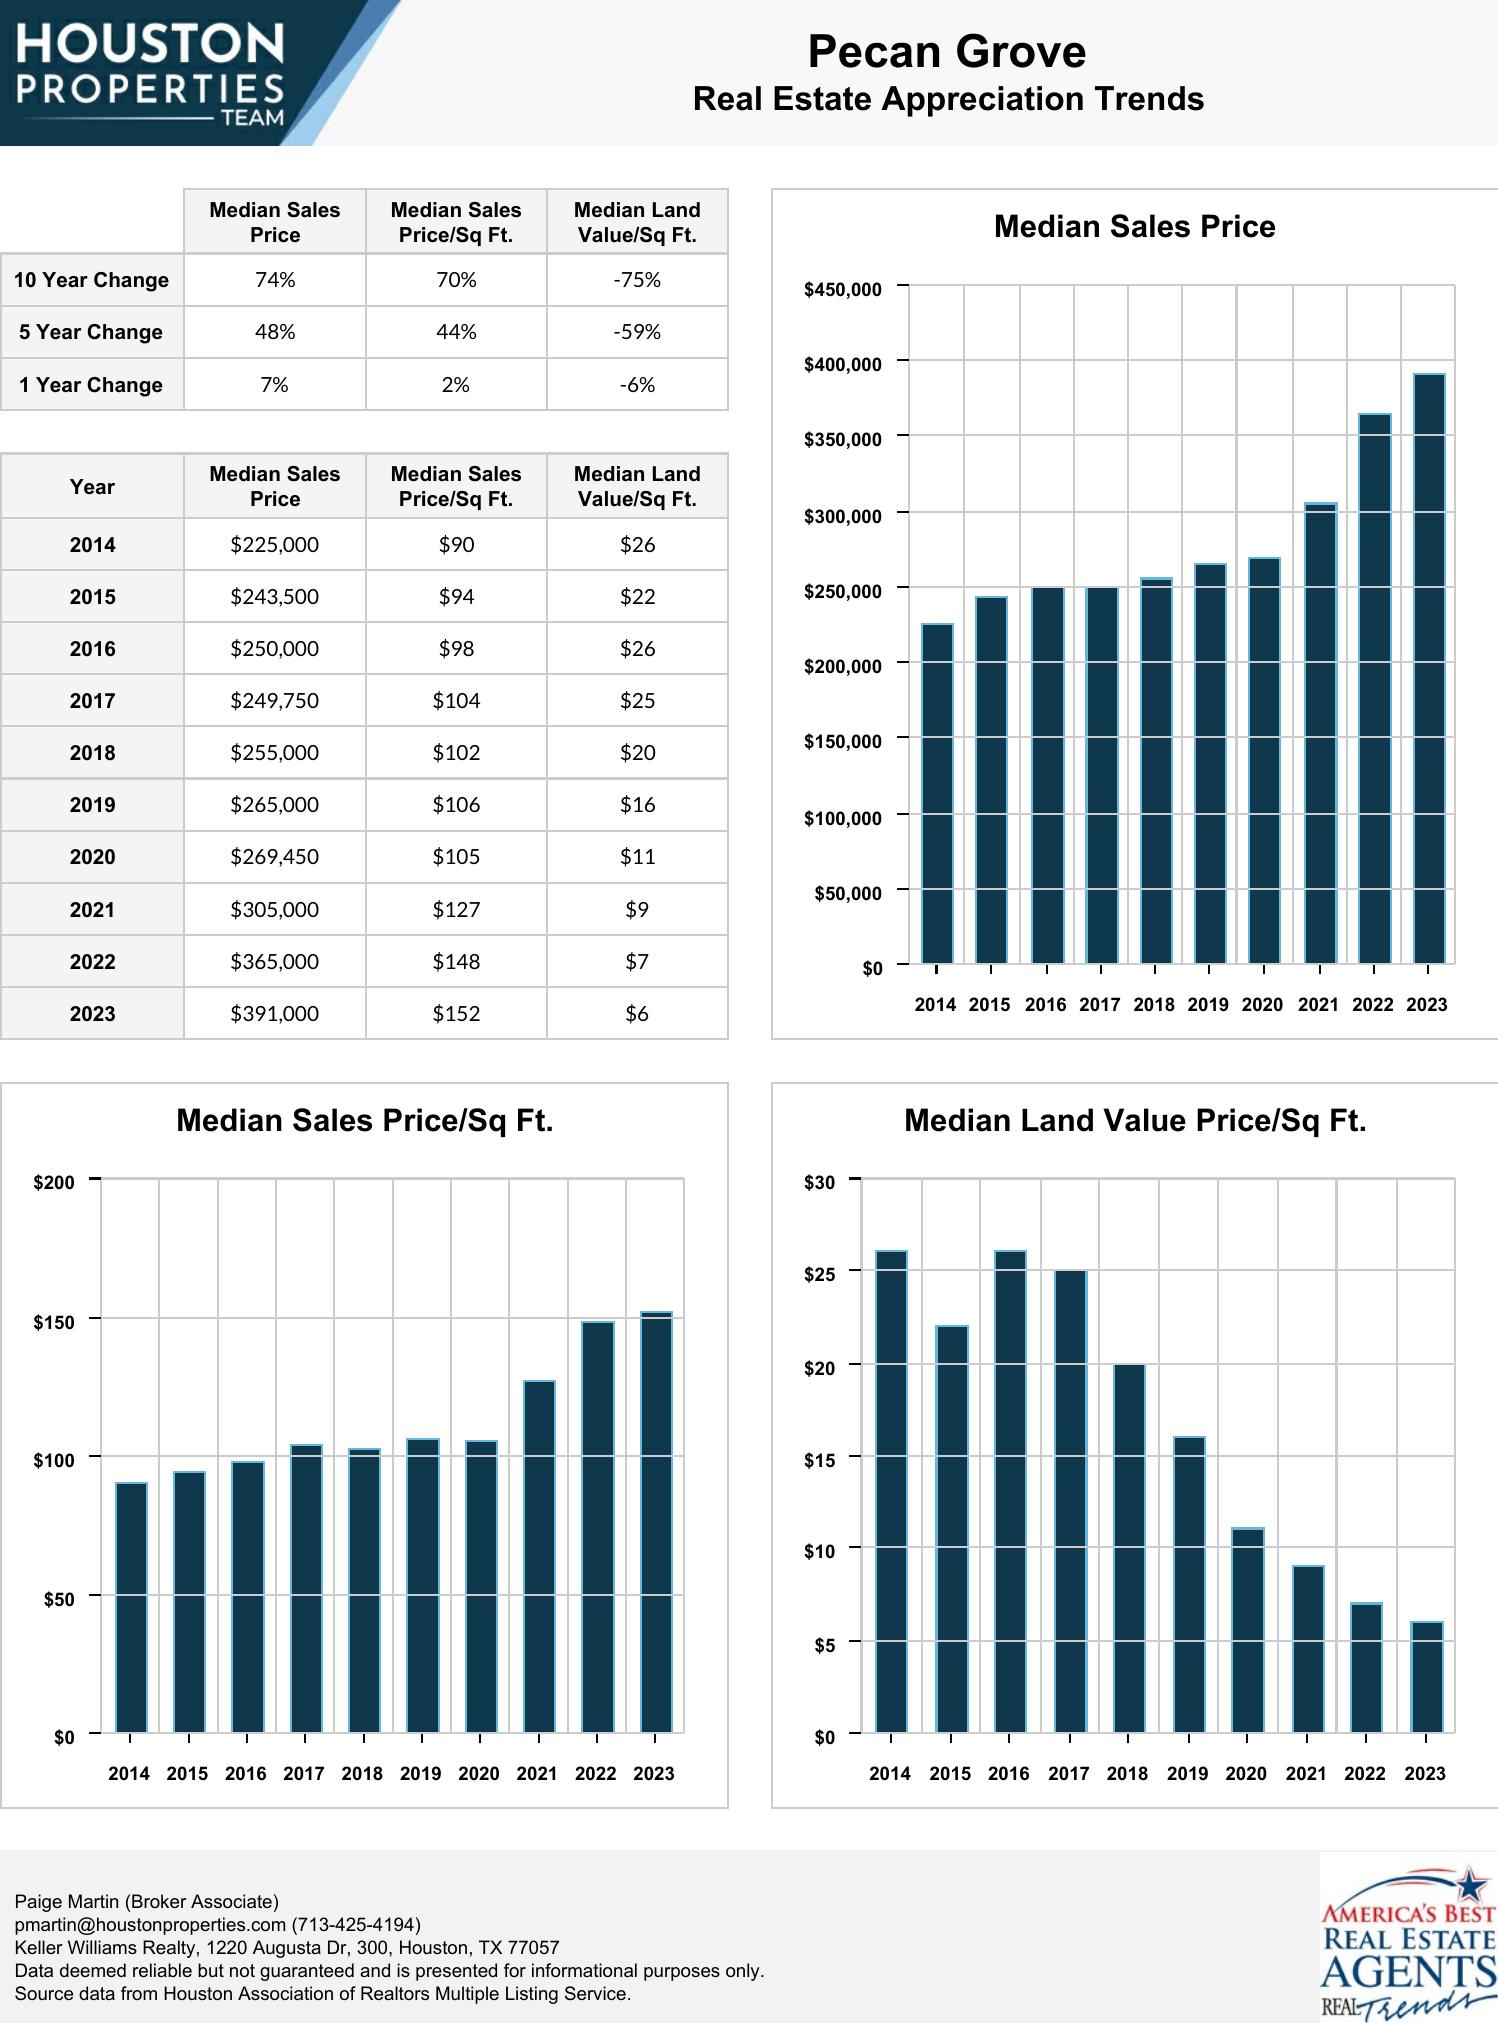 Pecan Grove Real Estate Trends